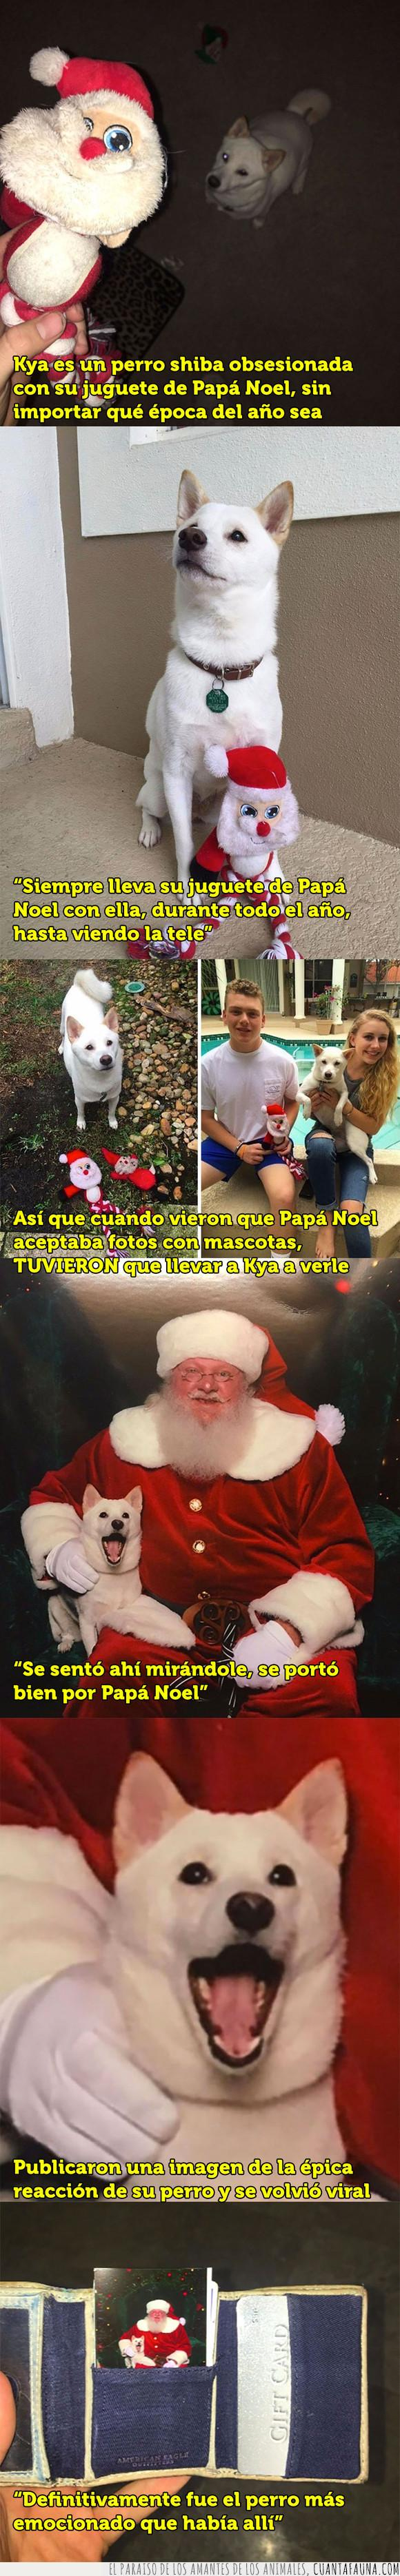 espíritu navideño,navidad,perro,santa claus